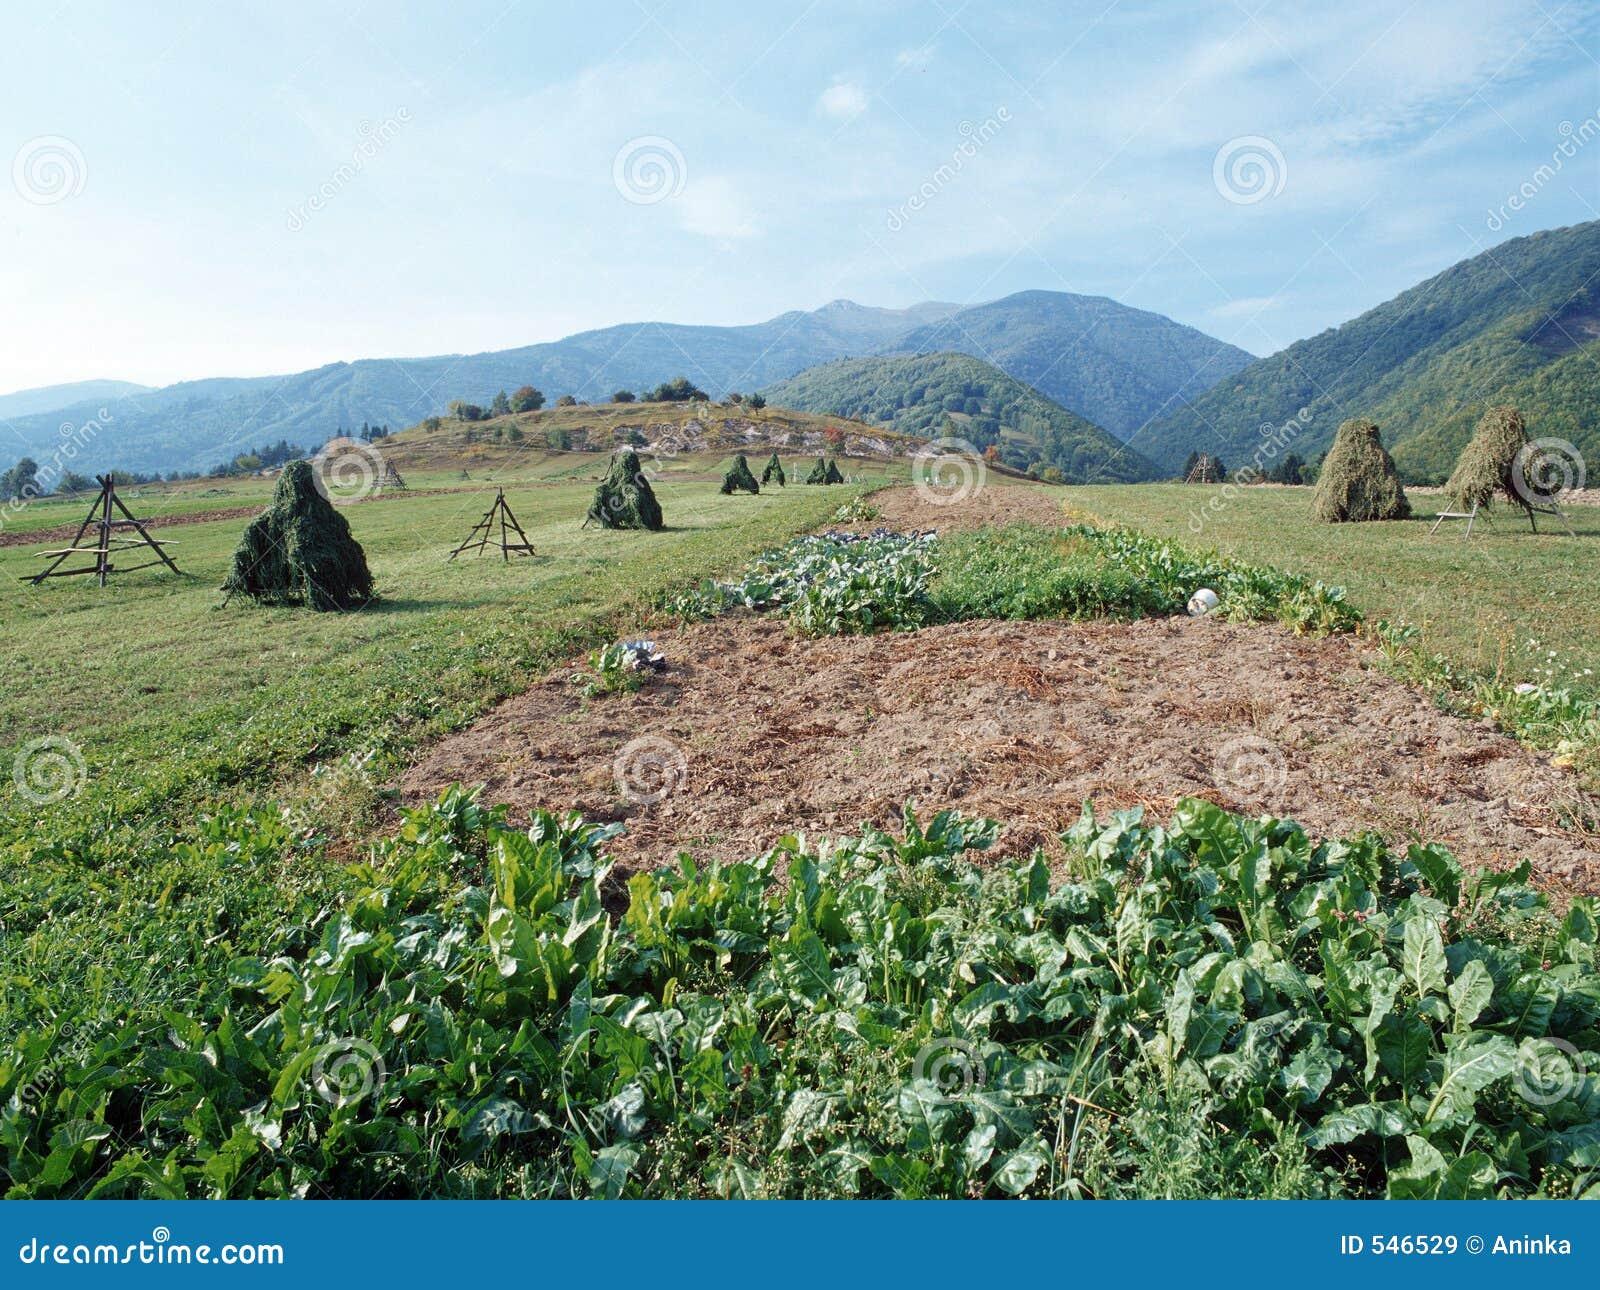 Download 干草堆视图 库存图片. 图片 包括有 混淆, 秸杆, 帐篷, 村庄, 庄稼, 干燥, 麦子, 欧洲, 山腰, 干草 - 546529